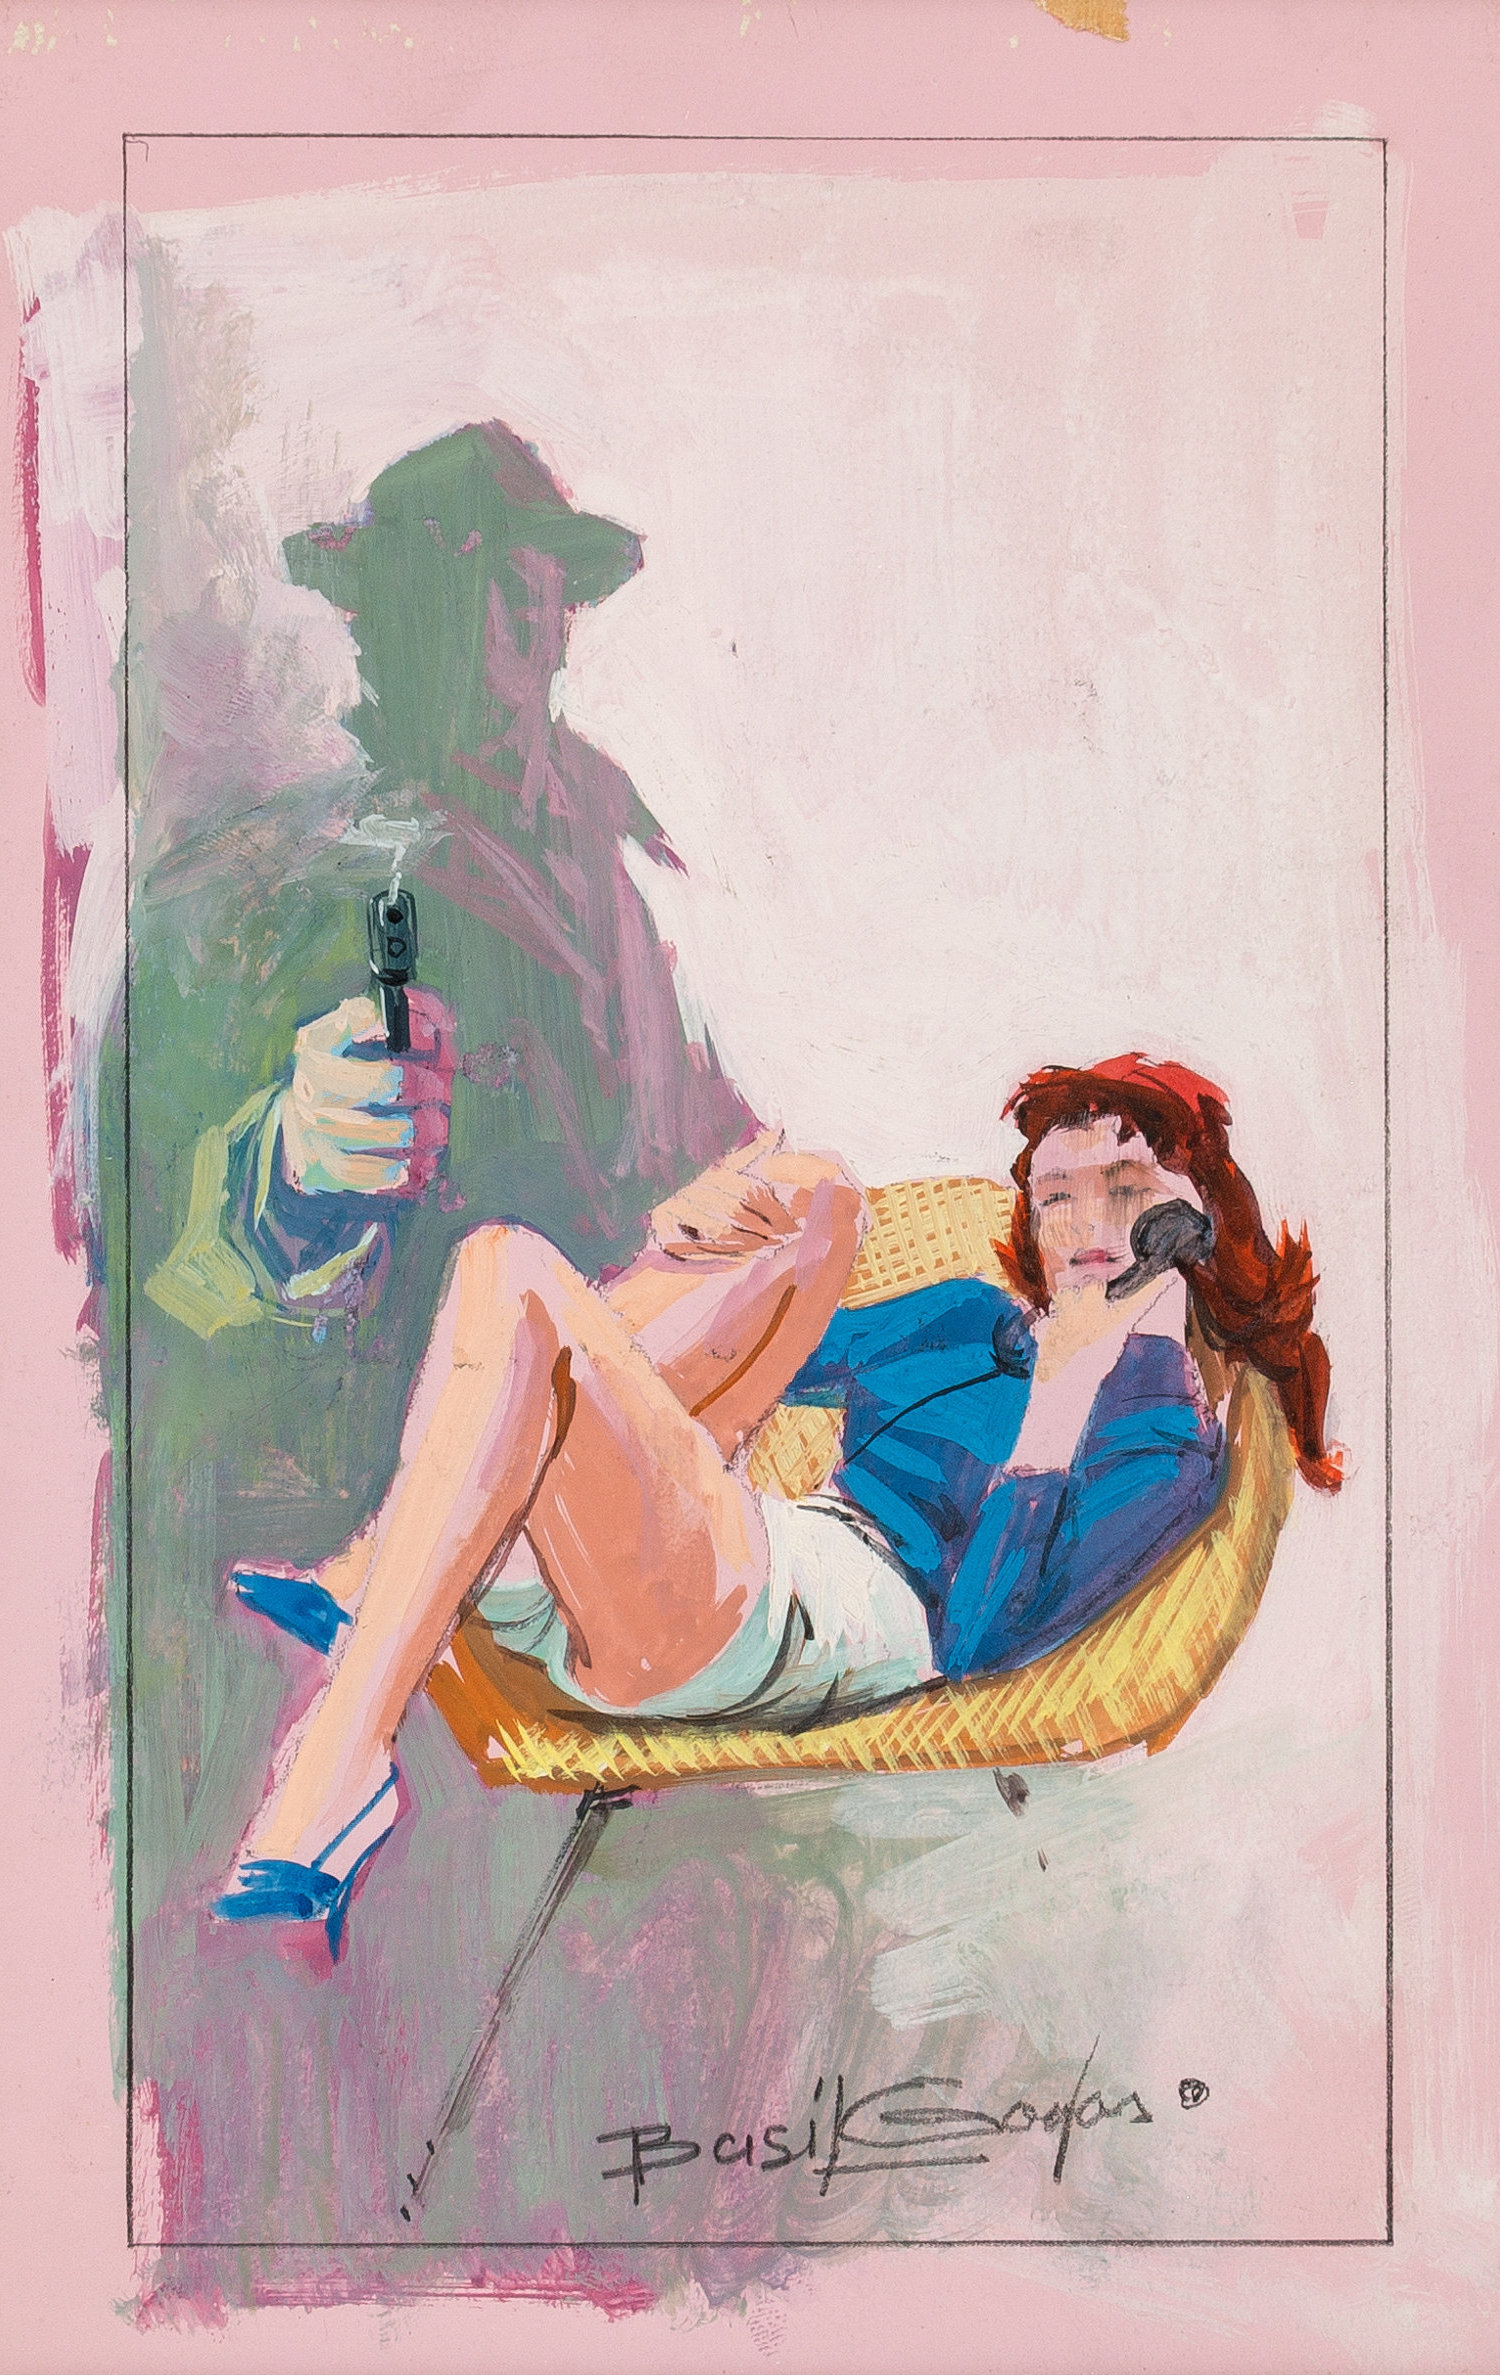 Paperback Novel Cover Preliminary  (undated).jpg